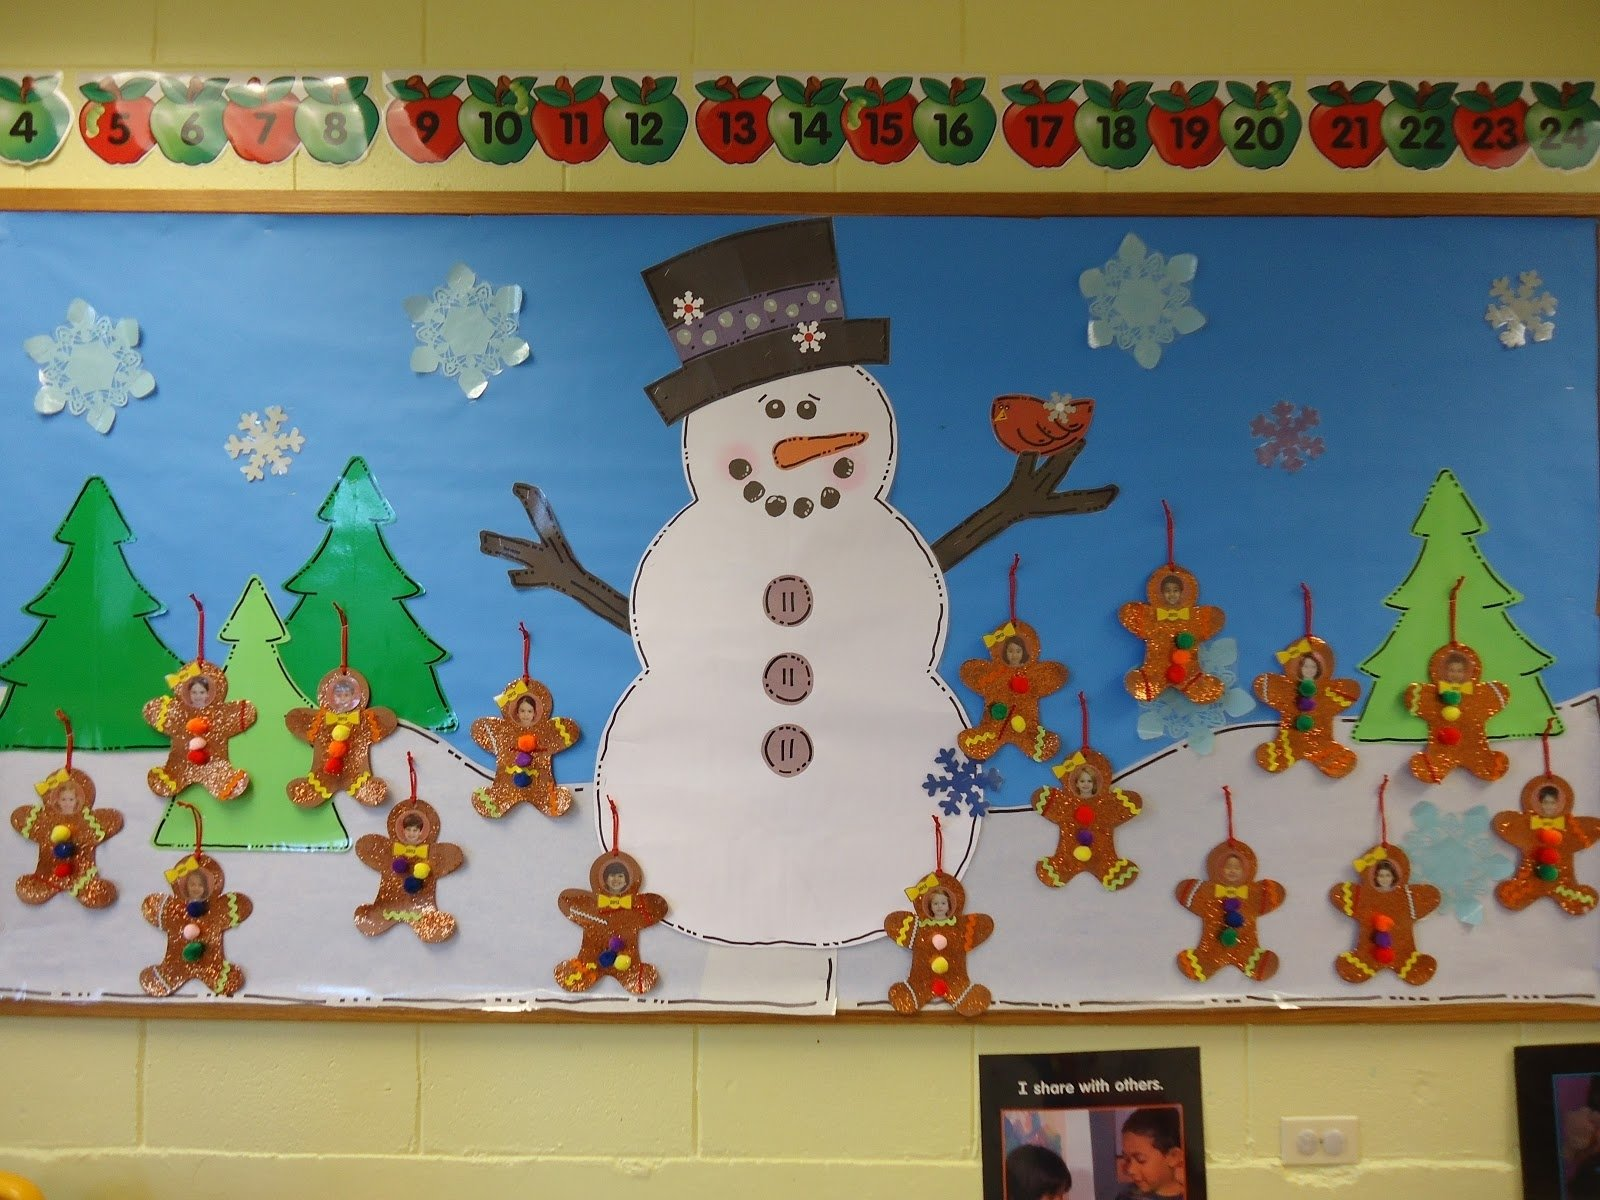 10 Wonderful Preschool Christmas Bulletin Board Ideas trinity preschool mount prospect gingerbread ornaments snowman 2 2020